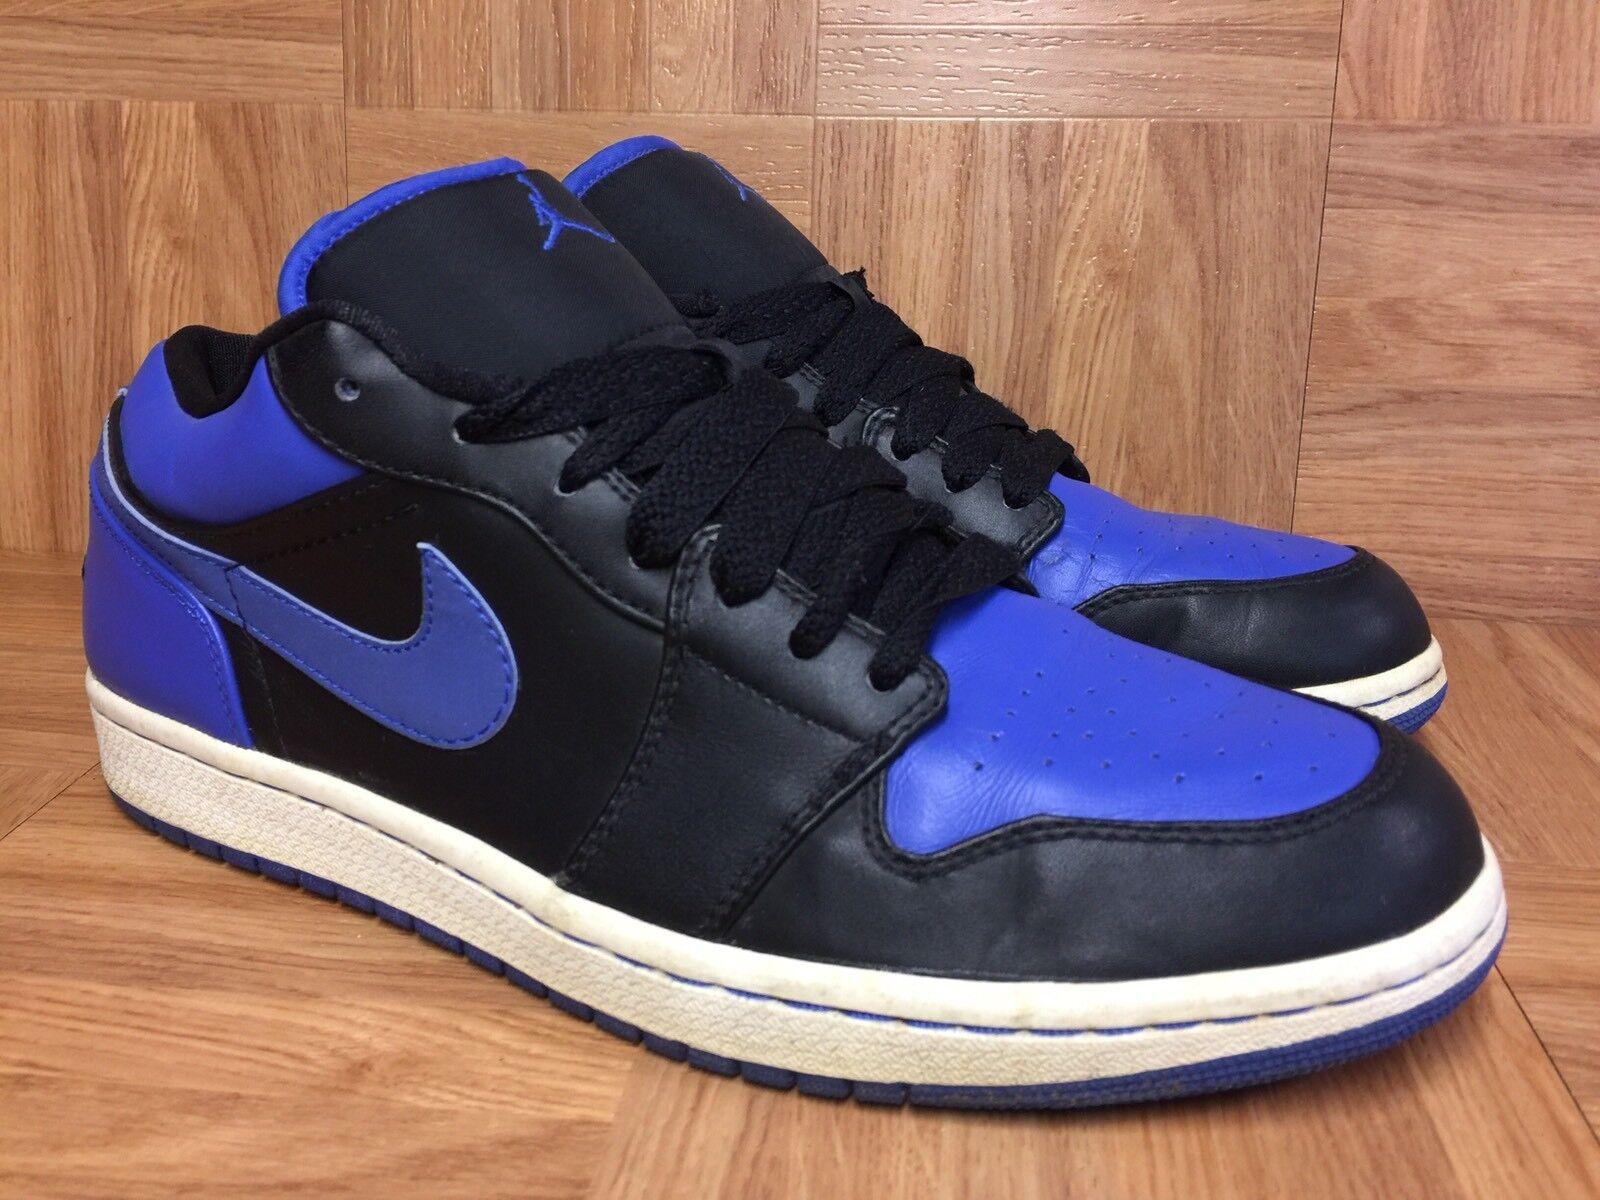 RARE Nike Air Jordan 1 Low Phat Black Varsity Royal Leather Sz 10.5 338145-041